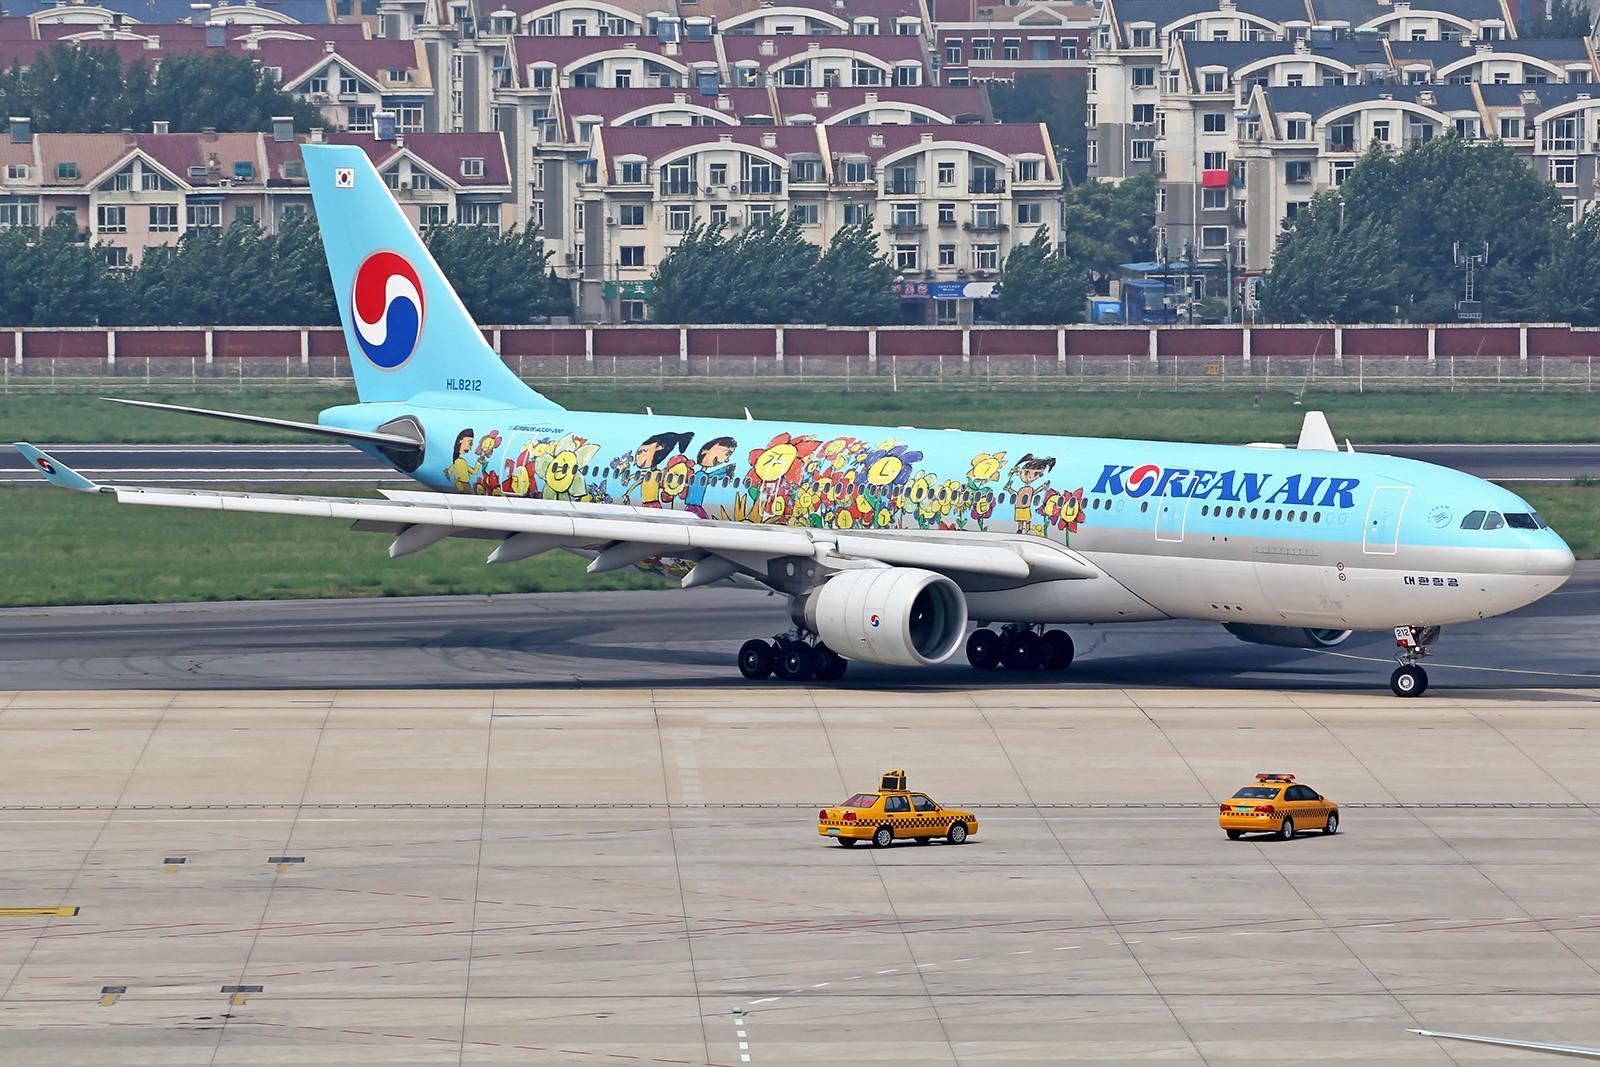 Re:[原创][DLC]。。。烂天的大韩332彩绘。。。 AIRBUS A330-200 HL8212 中国大连周水子国际机场